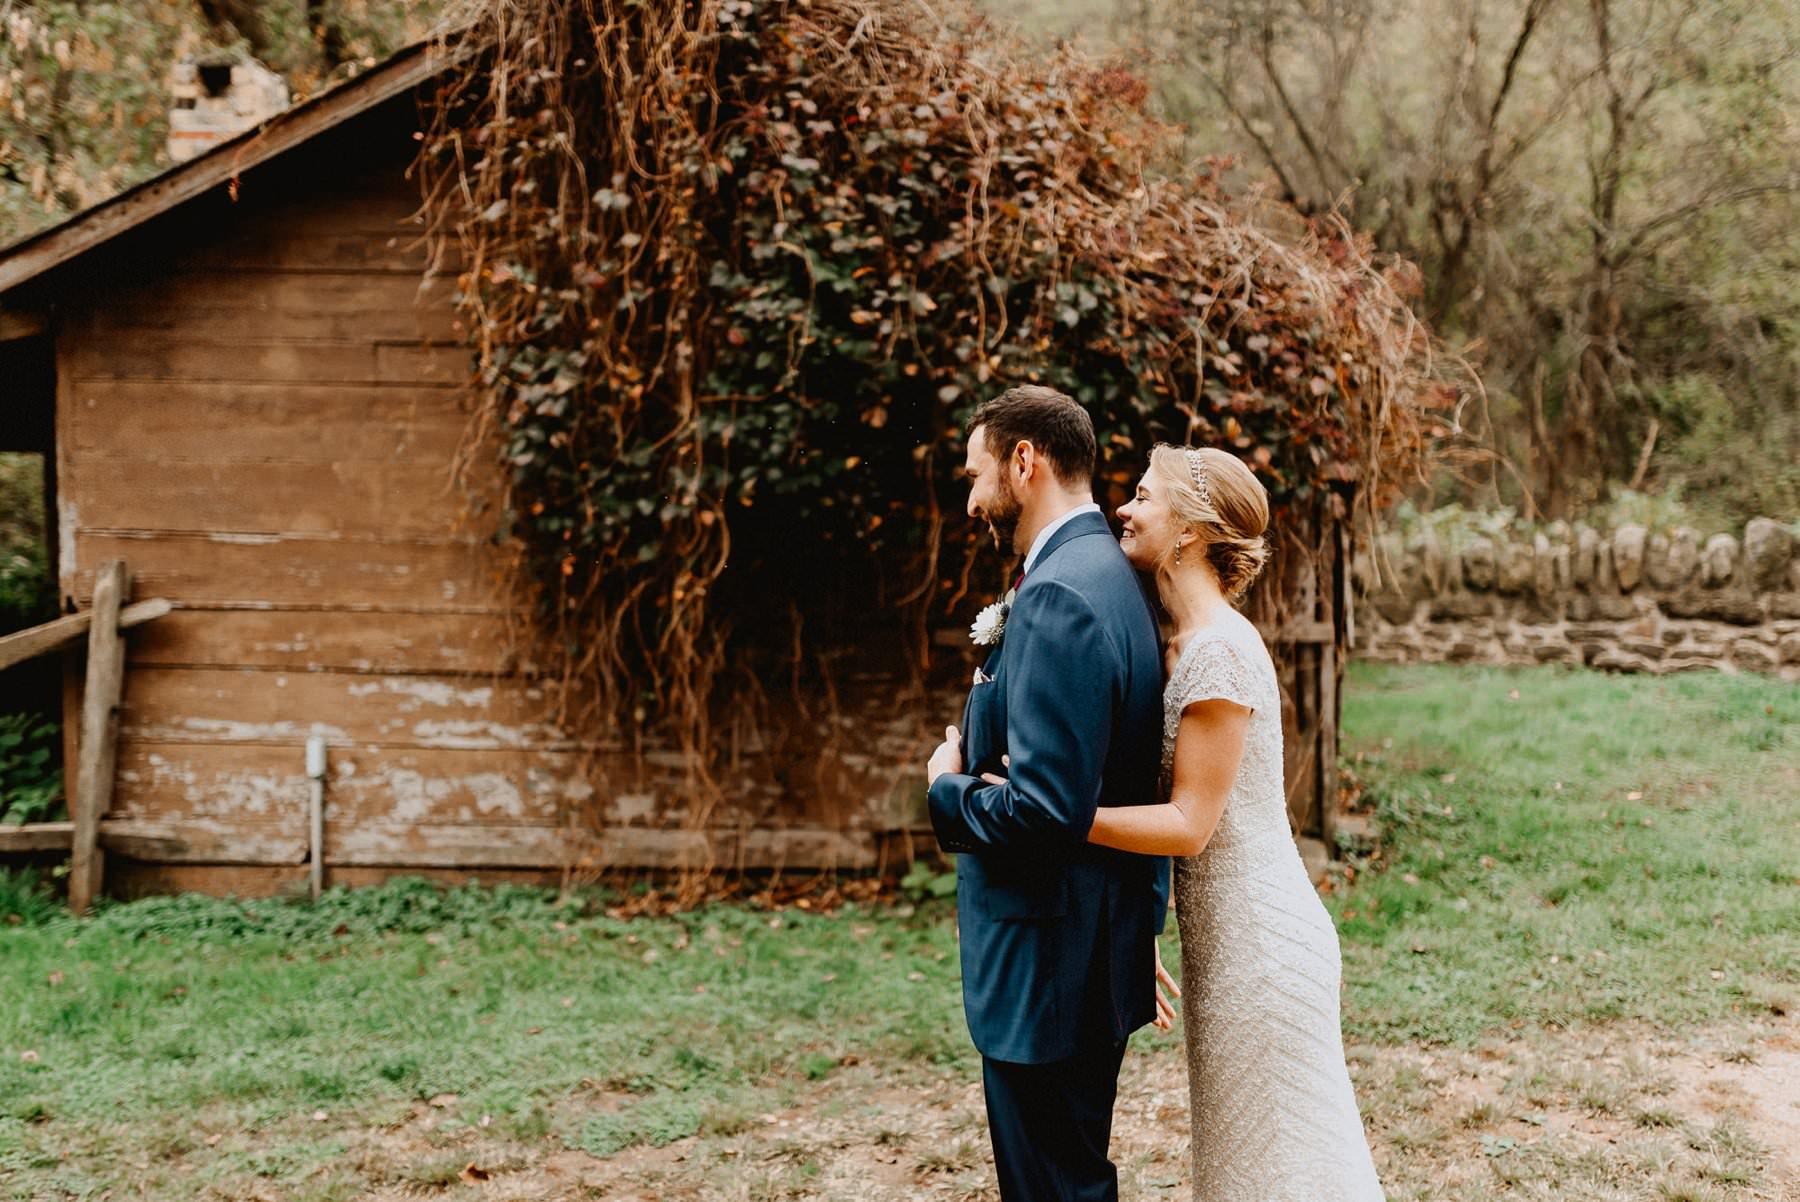 John_James_Audubon_Center_wedding-9.jpg